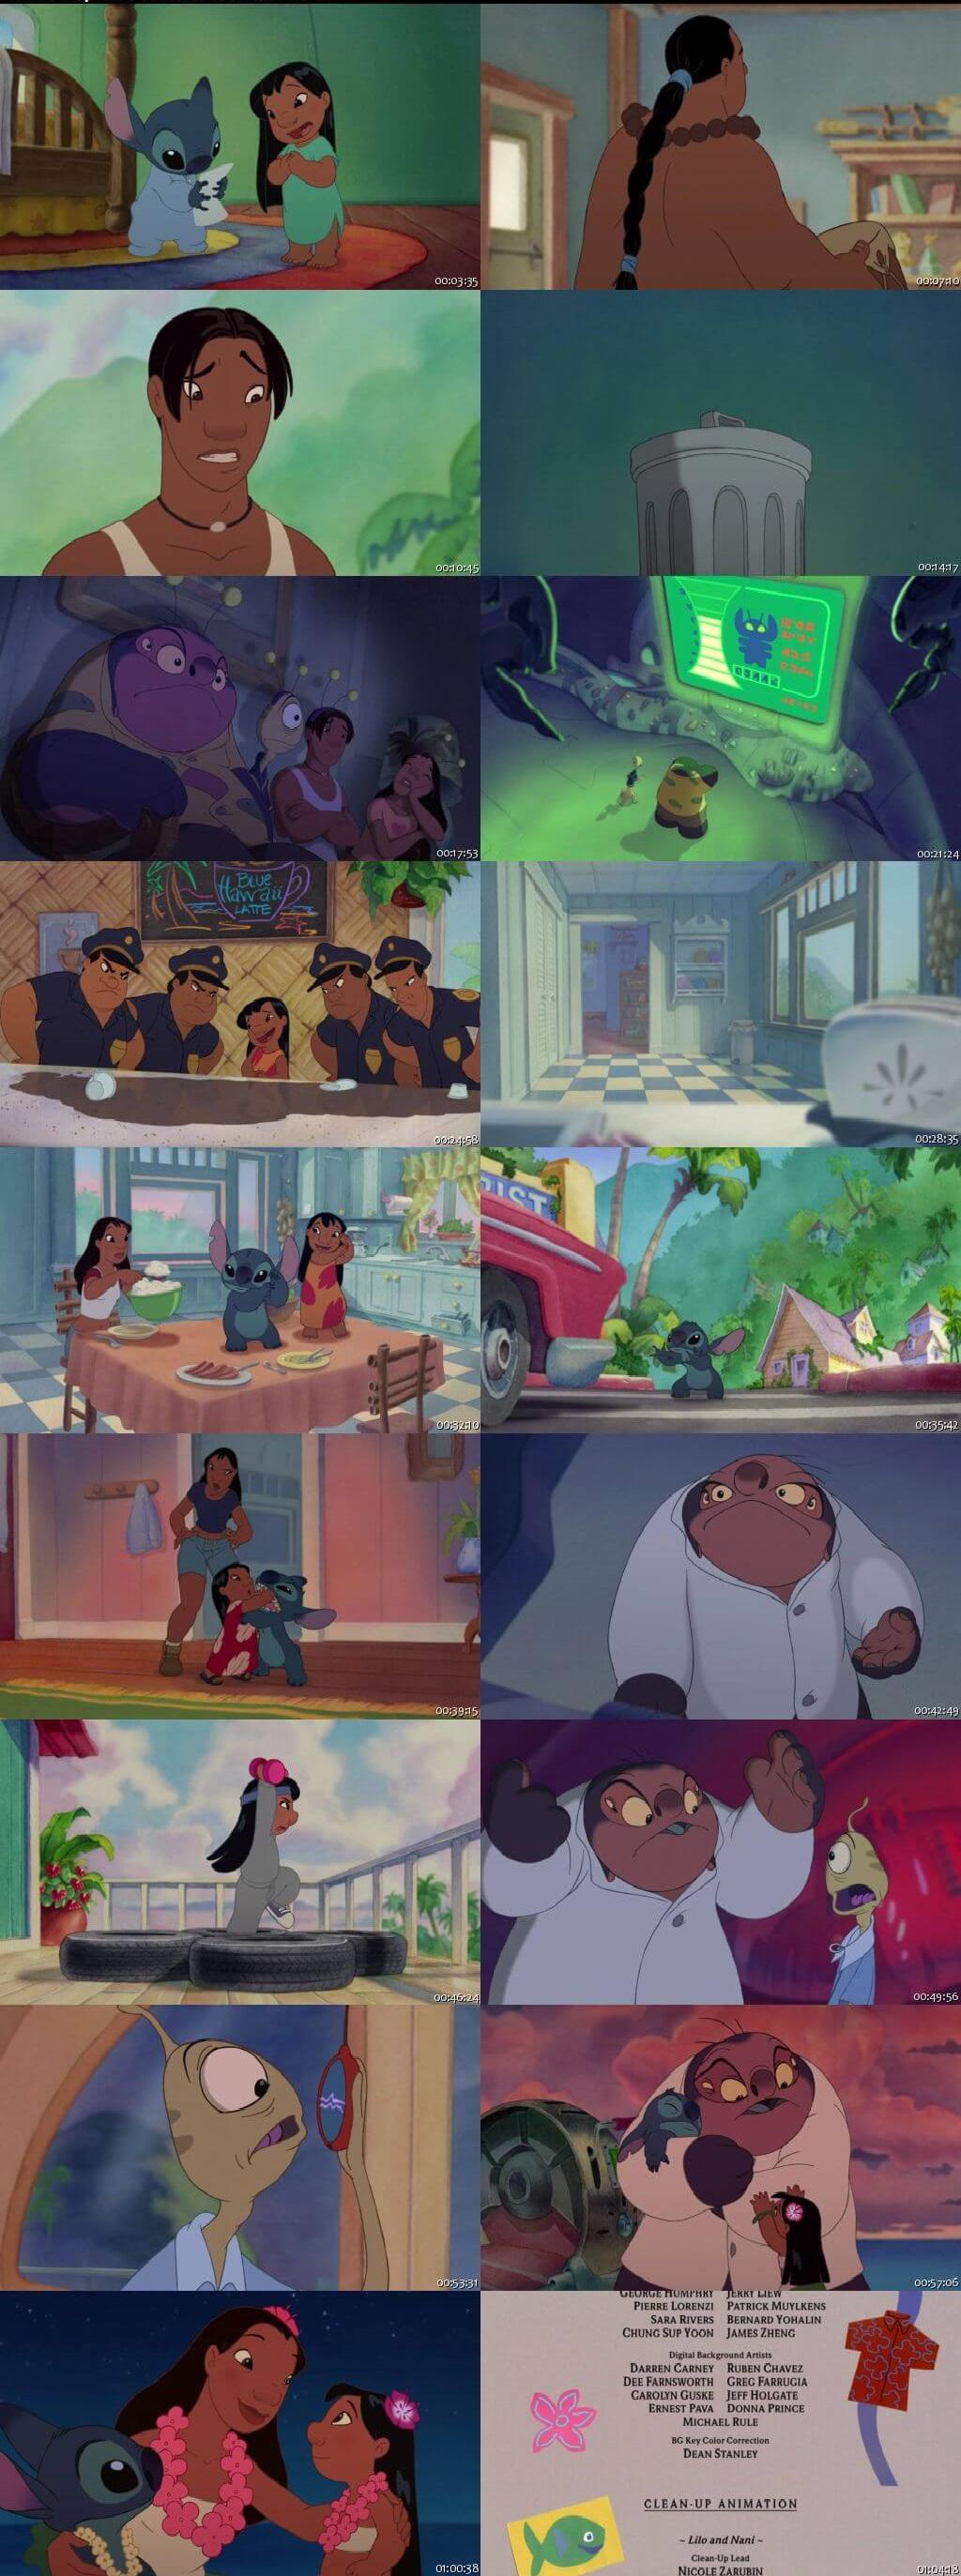 Screen Shot Of Lilo & Stitch 2: Stitch Has a Glitch 2005 In Hindi English Dual Audio Bluray